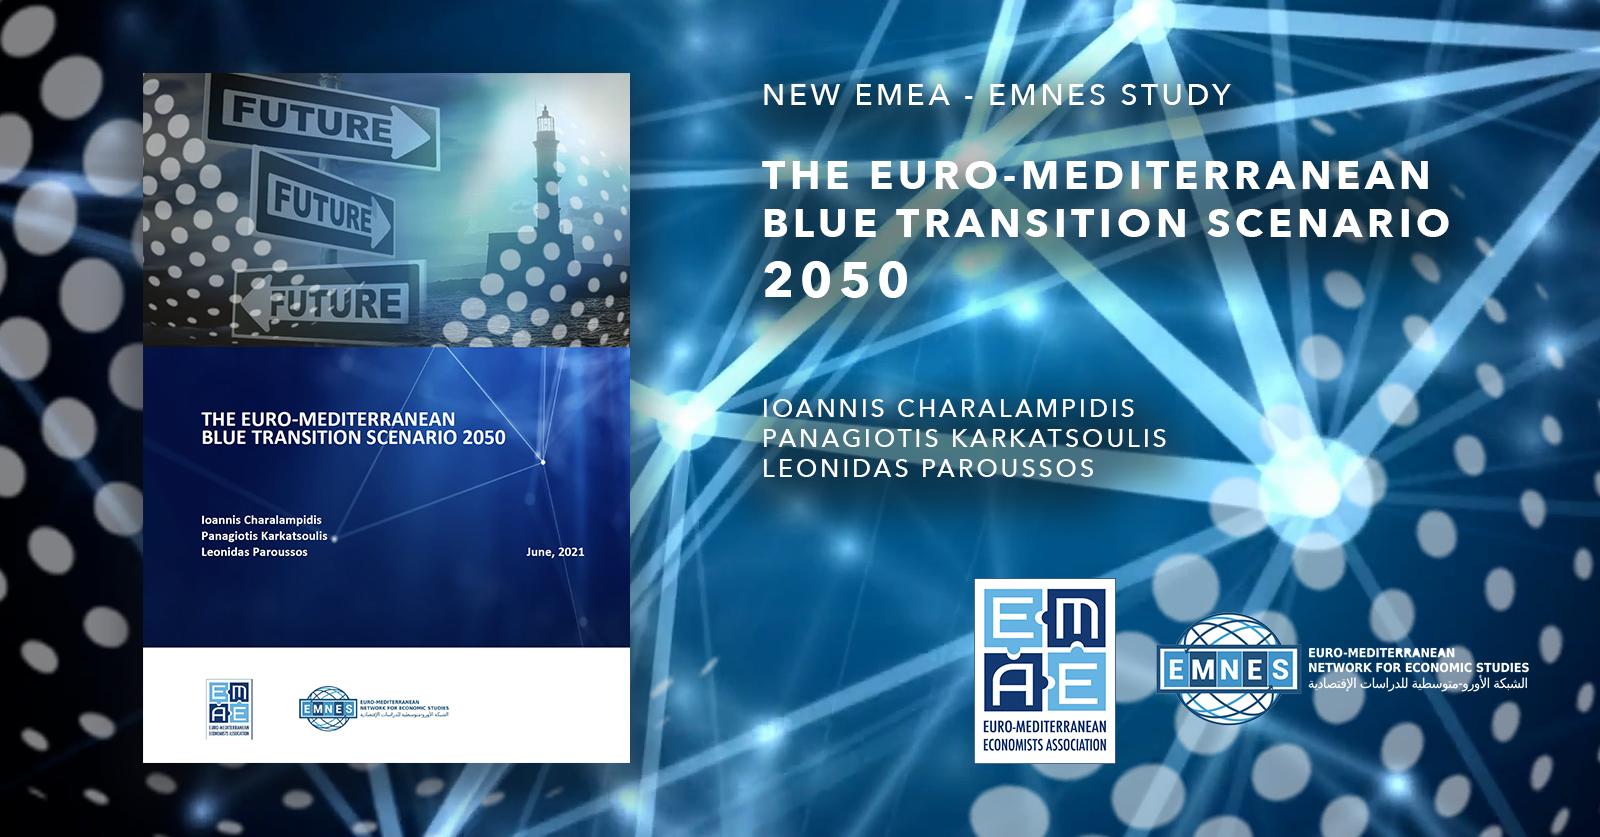 New EMEA – EMNES study: The Euro-Mediterranean Blue Transition Scenario 2050